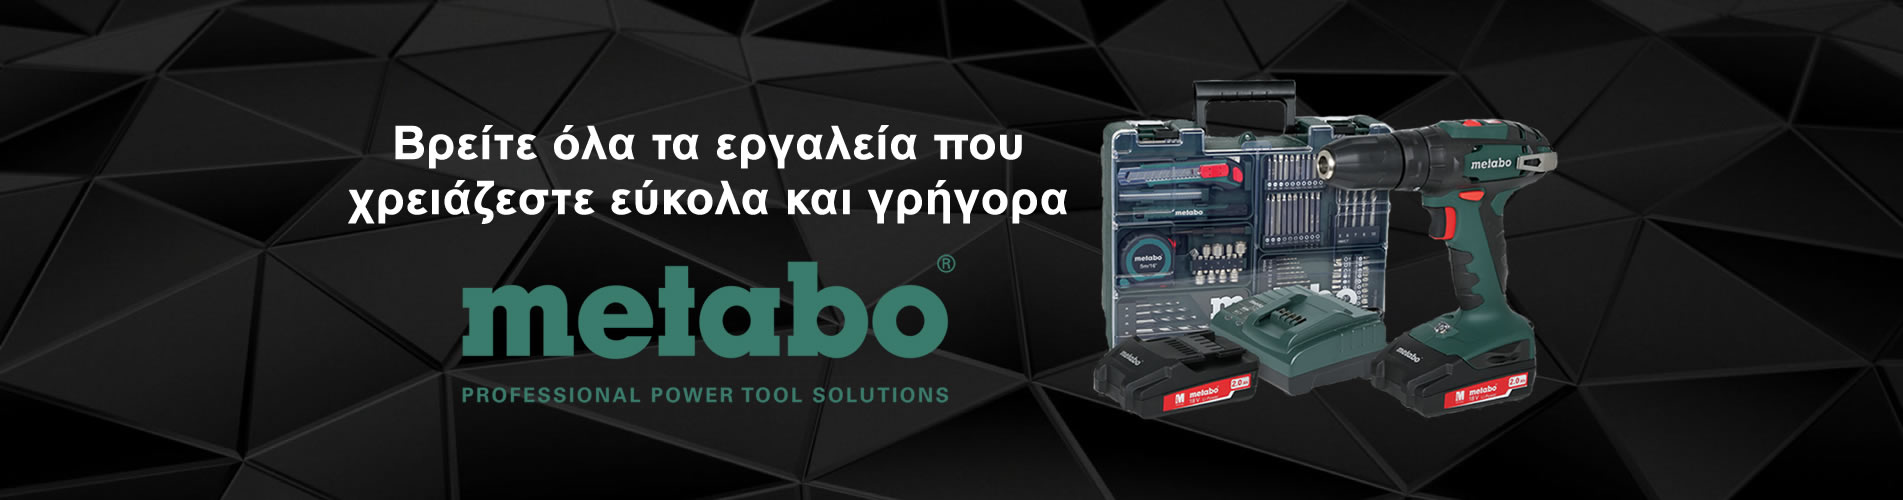 Stereotiki Banner 4 - Metabo Distributor Slide